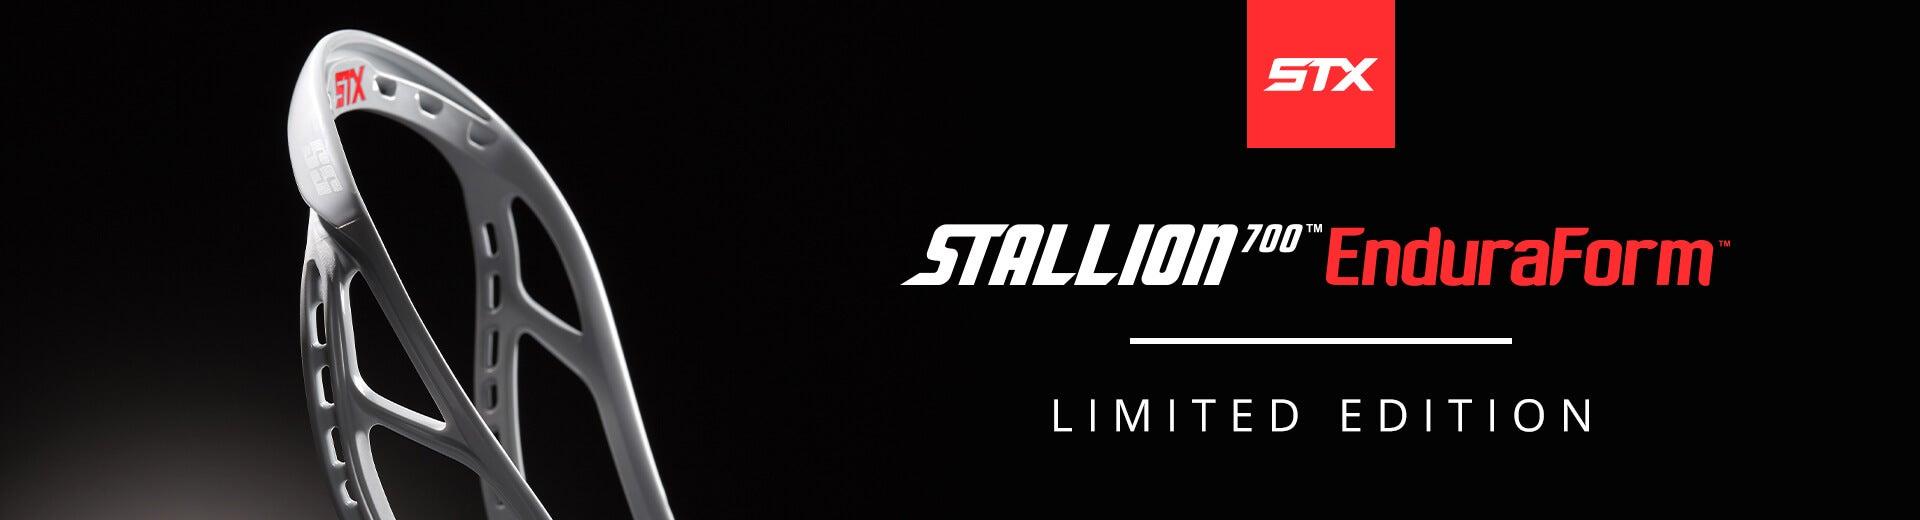 STX Stallion 700 Enduraform - DESKTOP